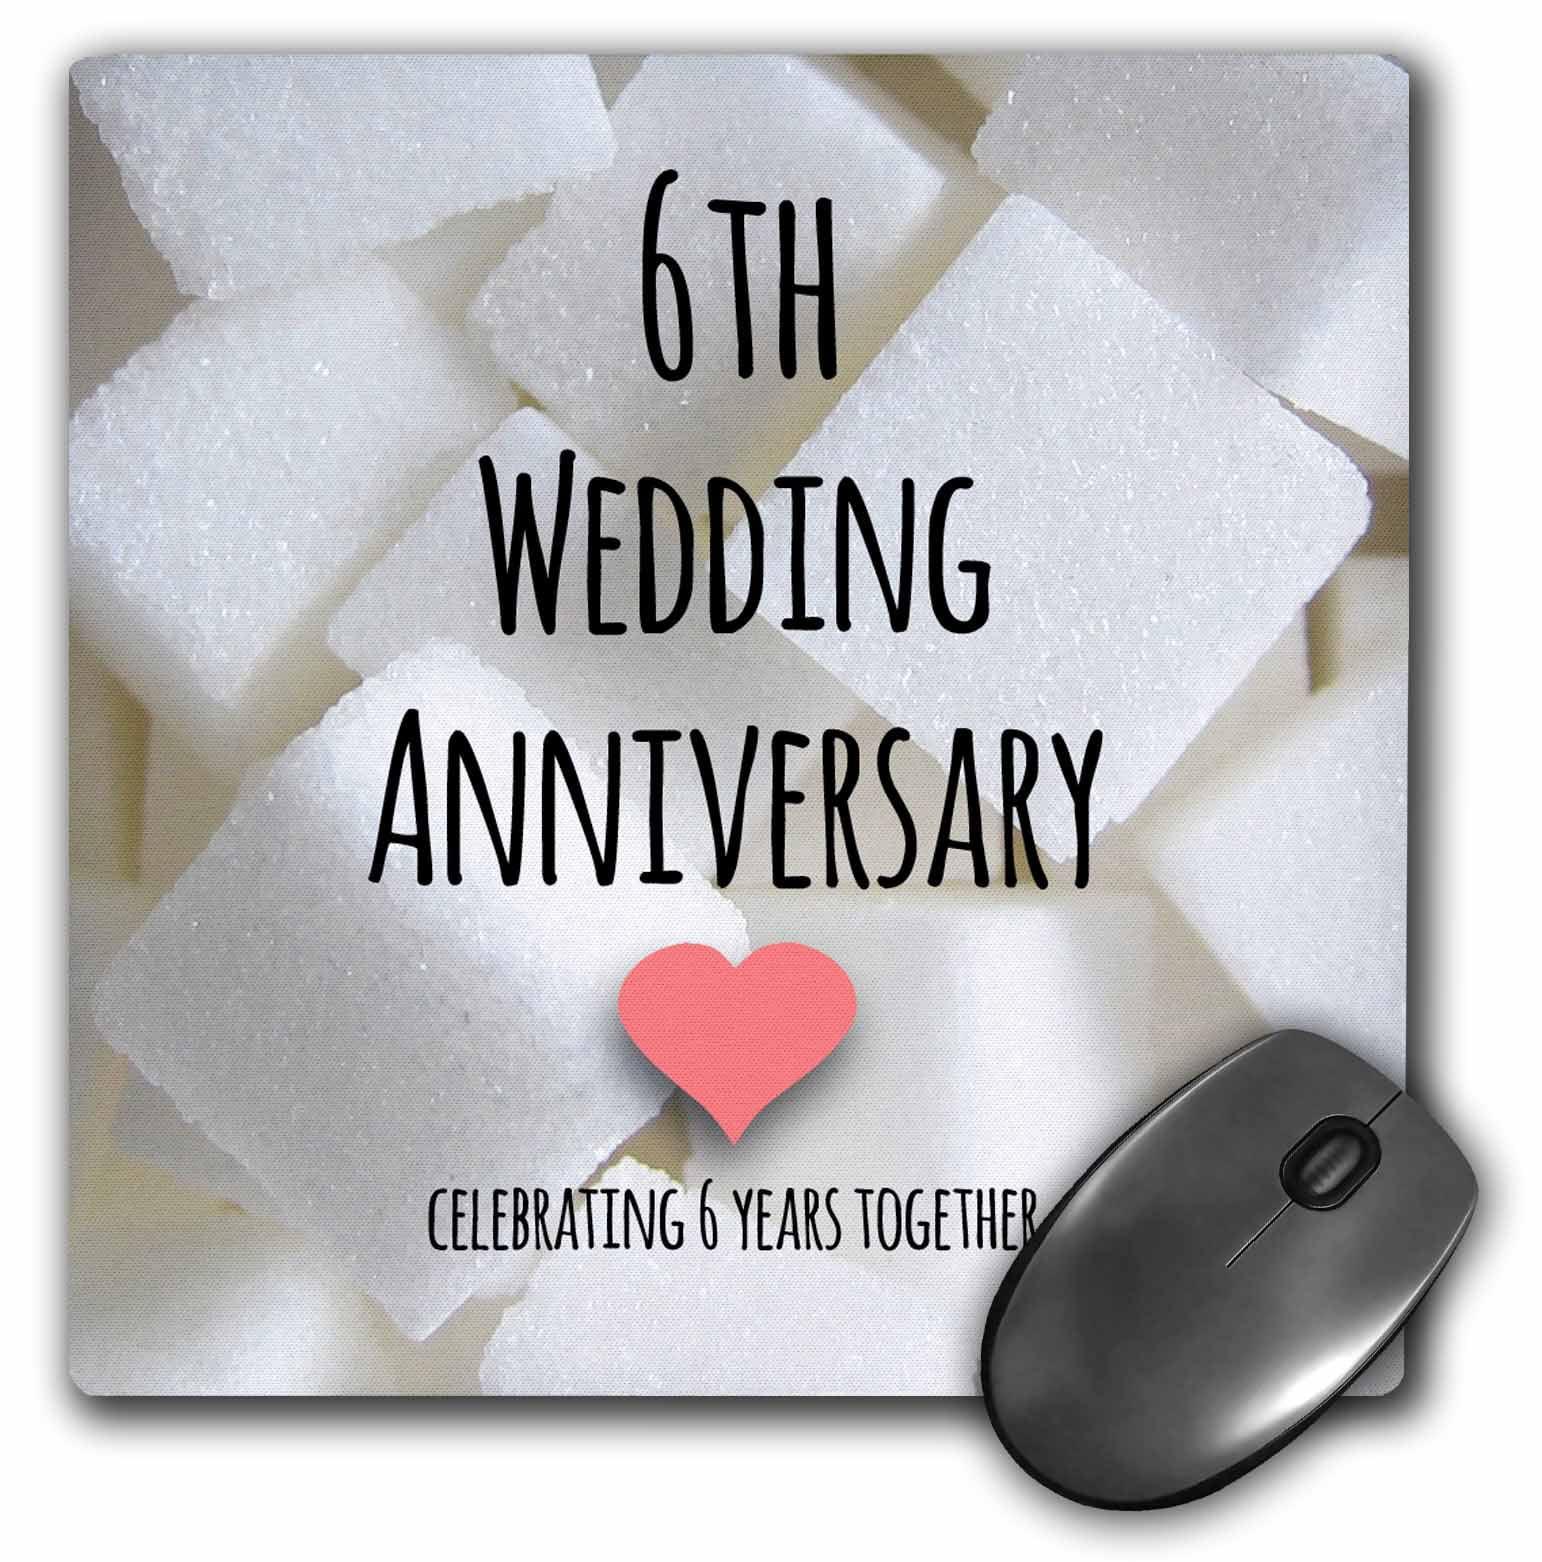 6 Yr Wedding Anniversary Gifts: 3dRose 6th Wedding Anniversary Gift